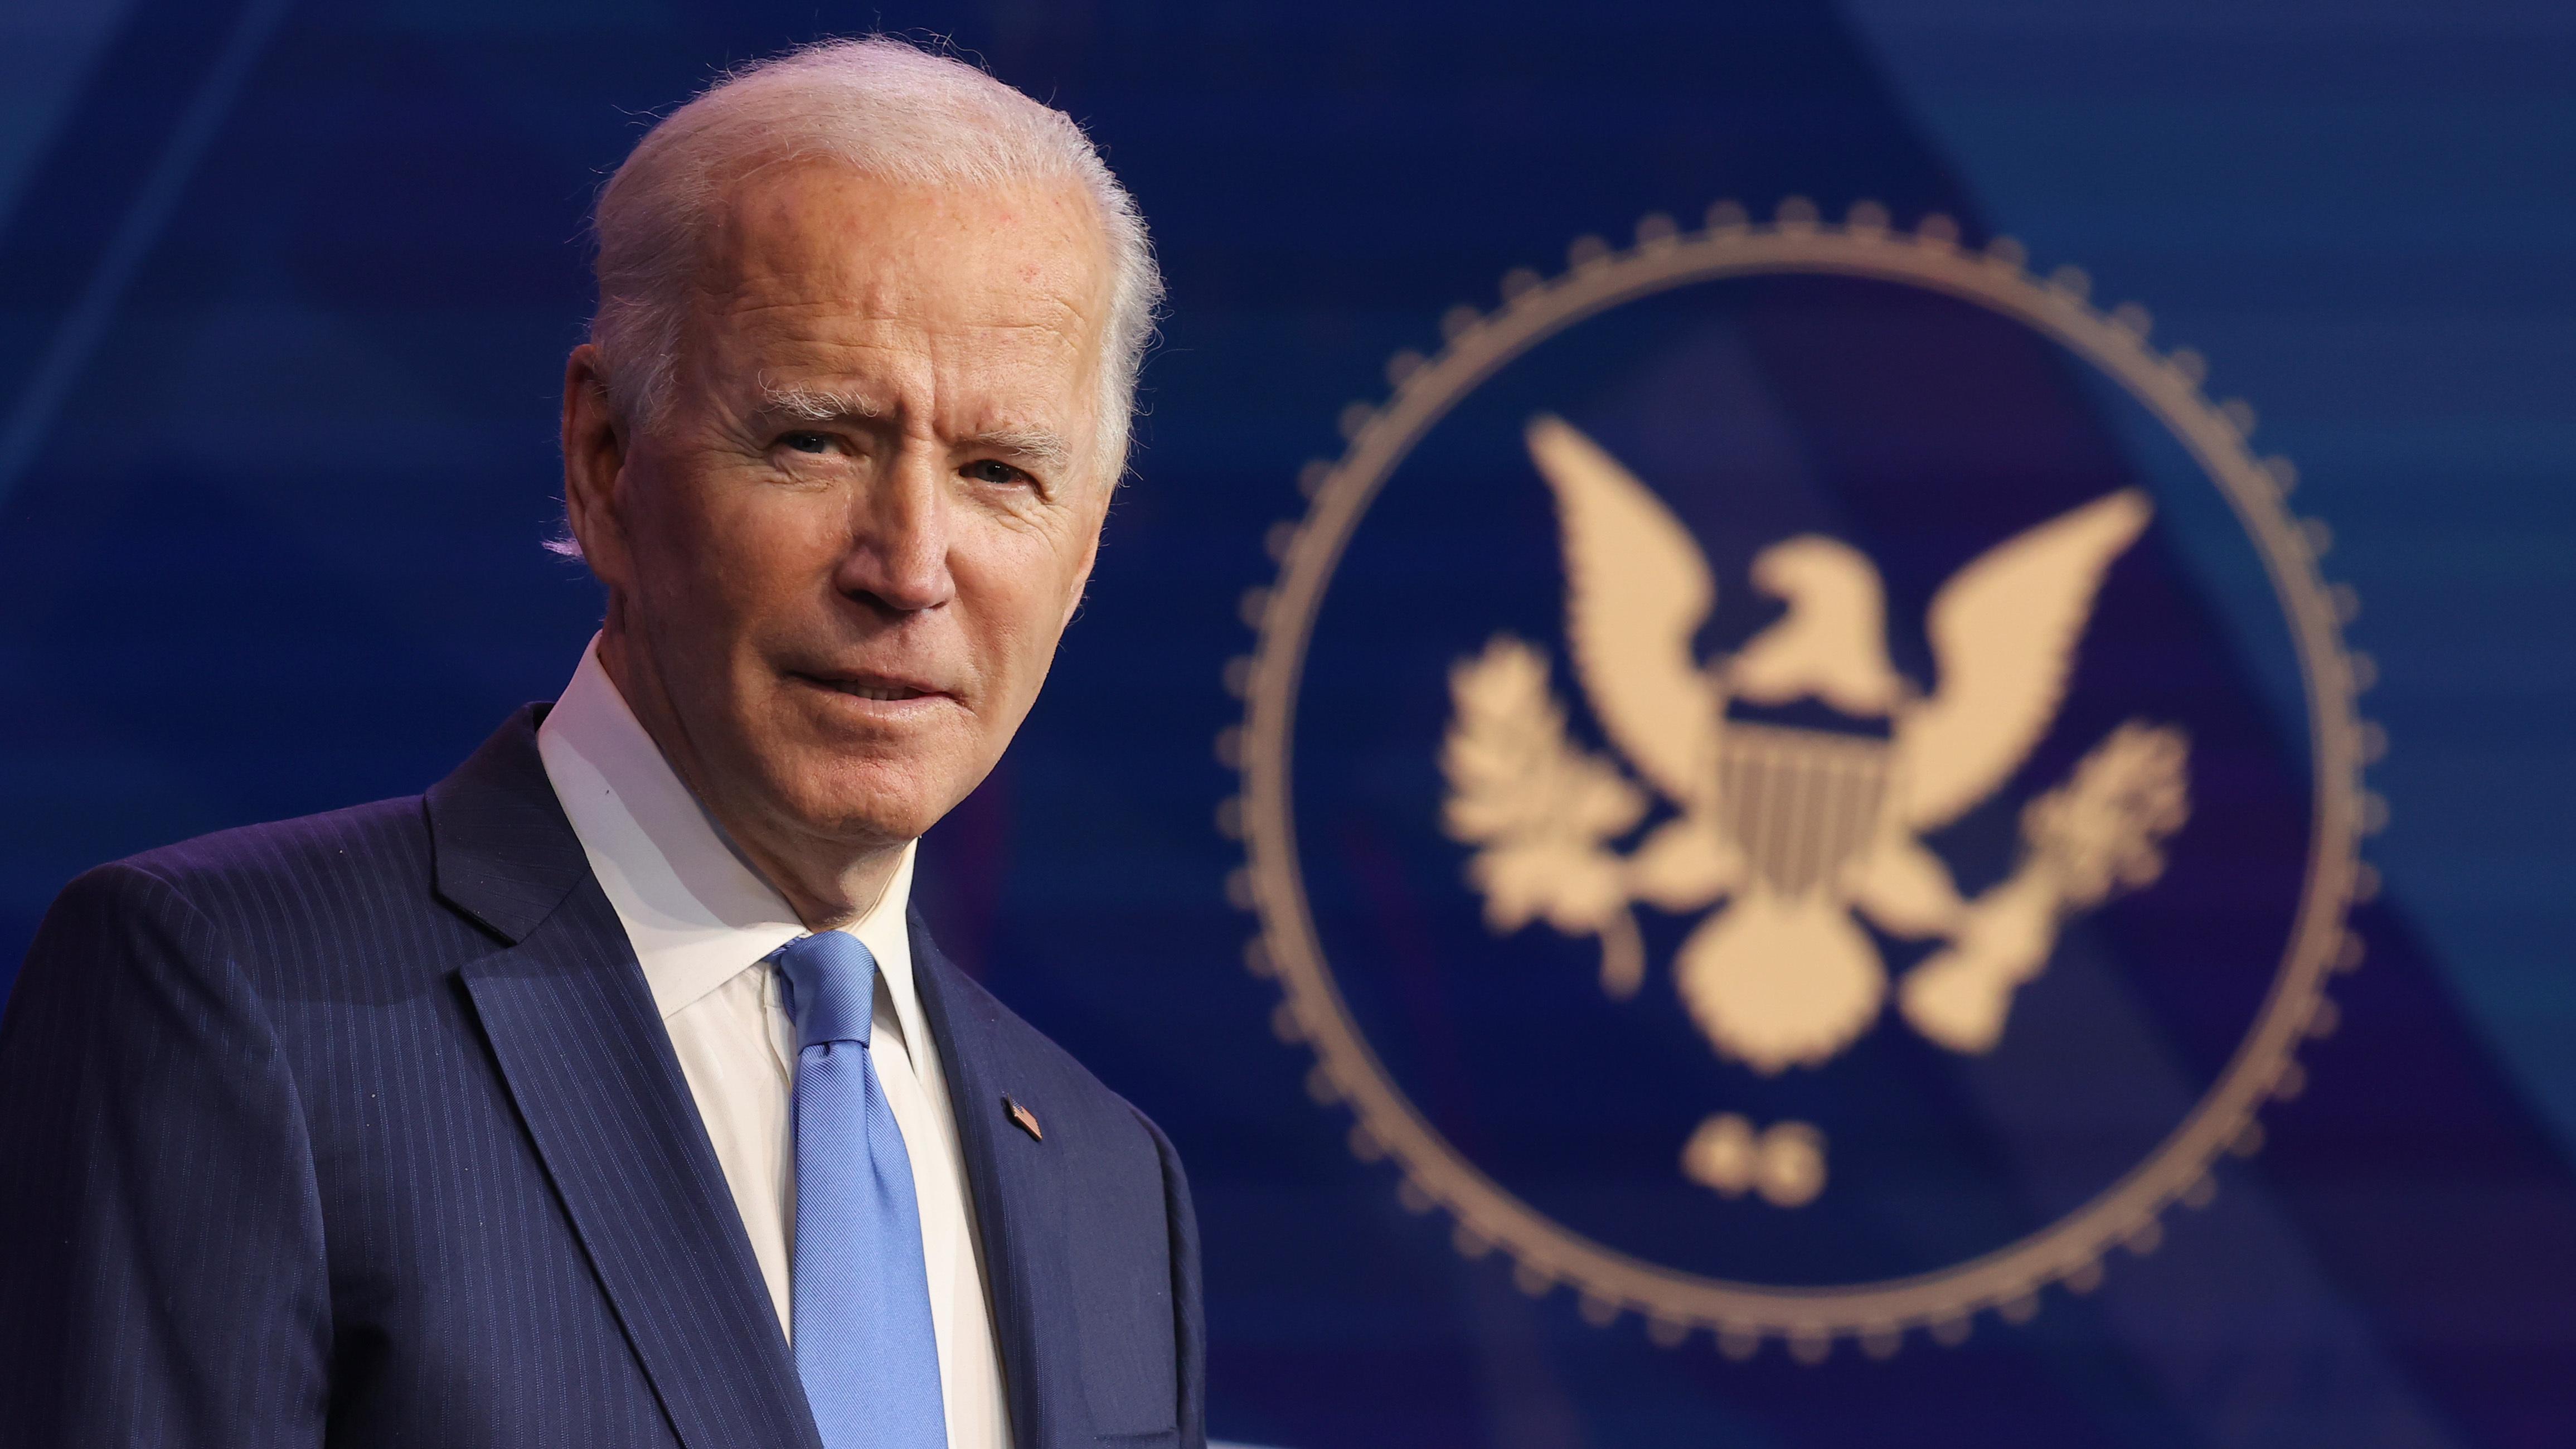 Vermont begins Electoral College voting with 3 votes for Biden